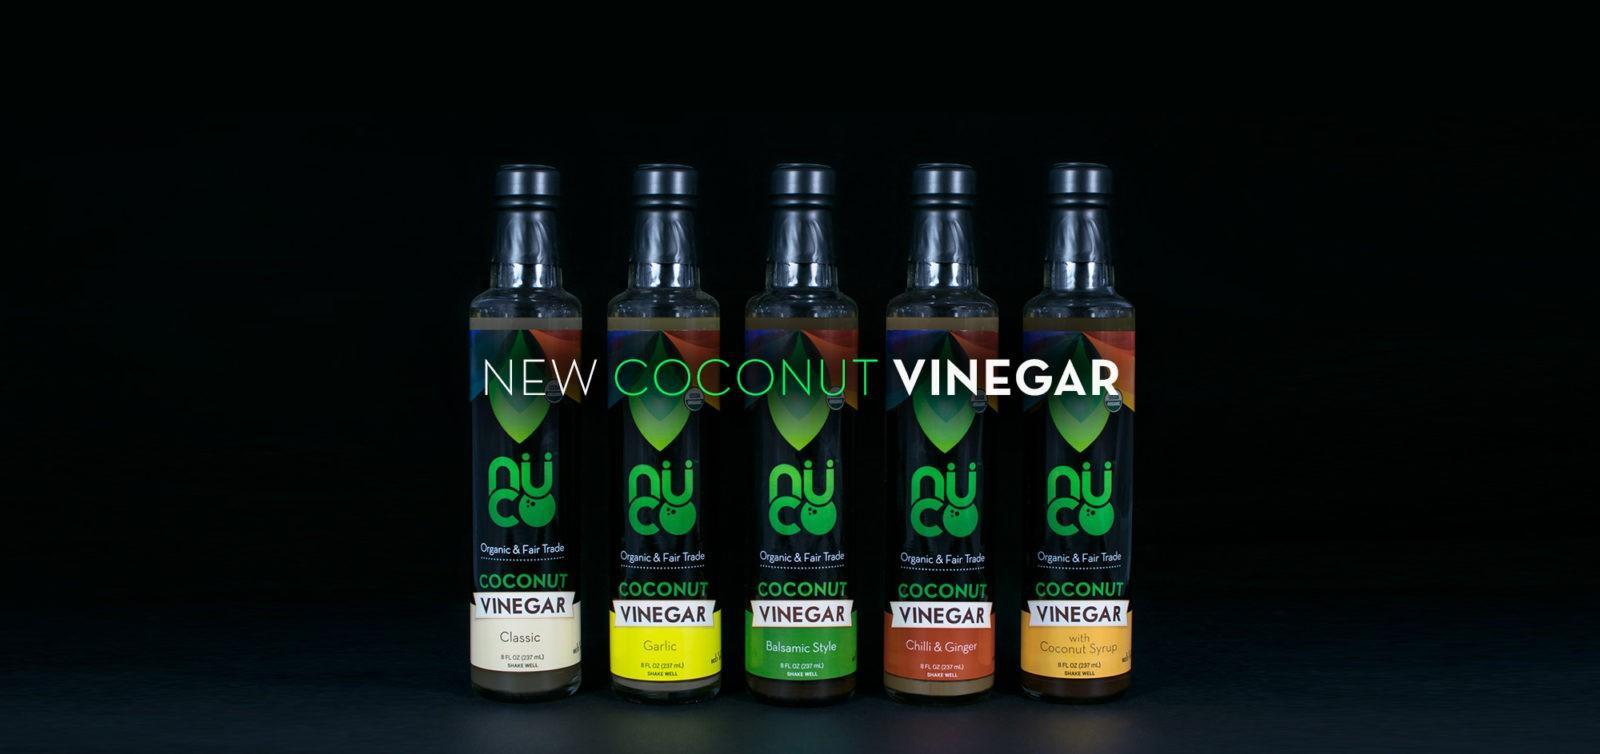 NUCO-Vinegar-Lineup2000-new5